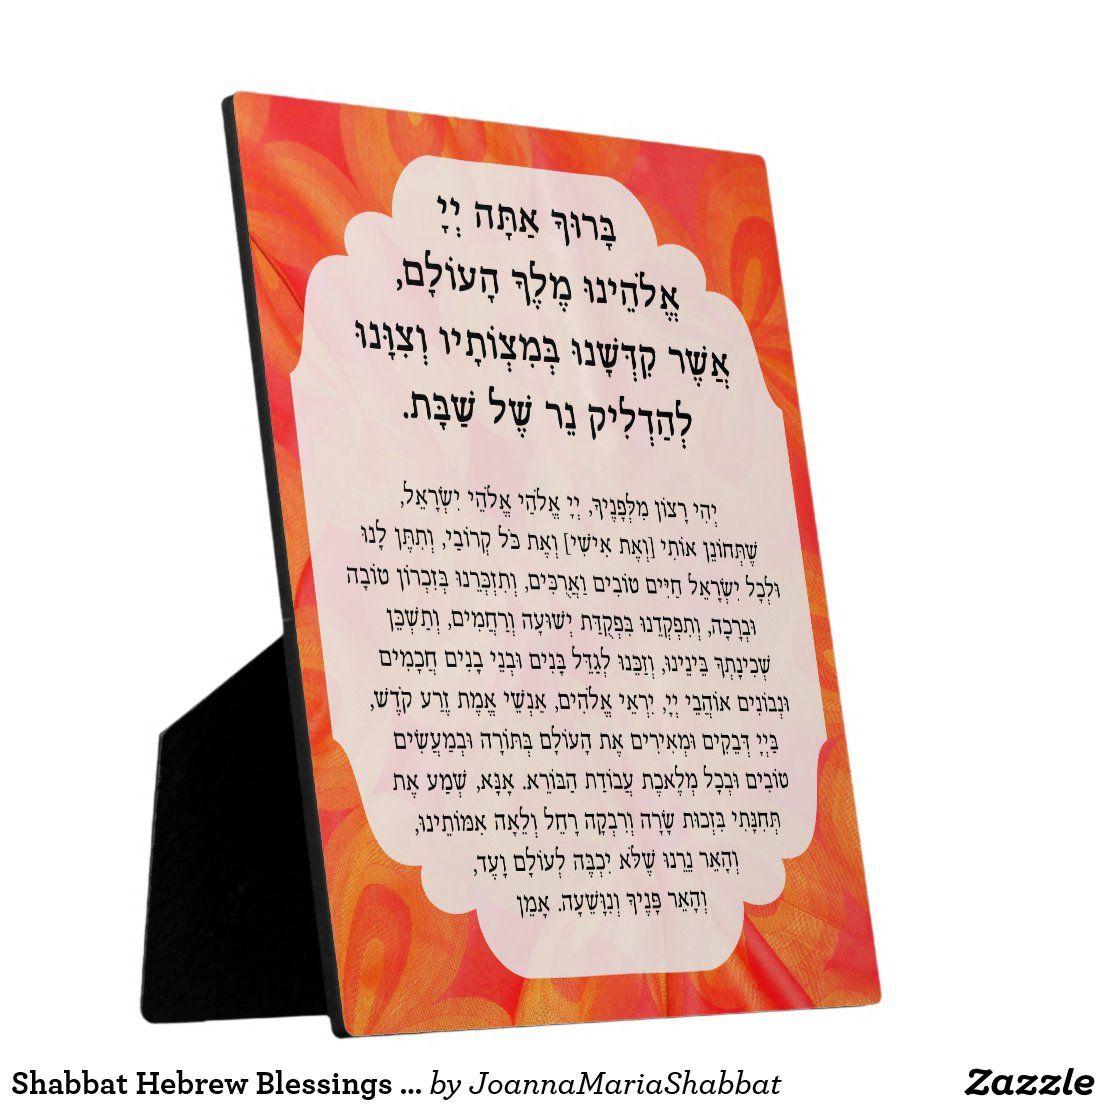 Shabbat Hebrew Blessings Prayer Candle